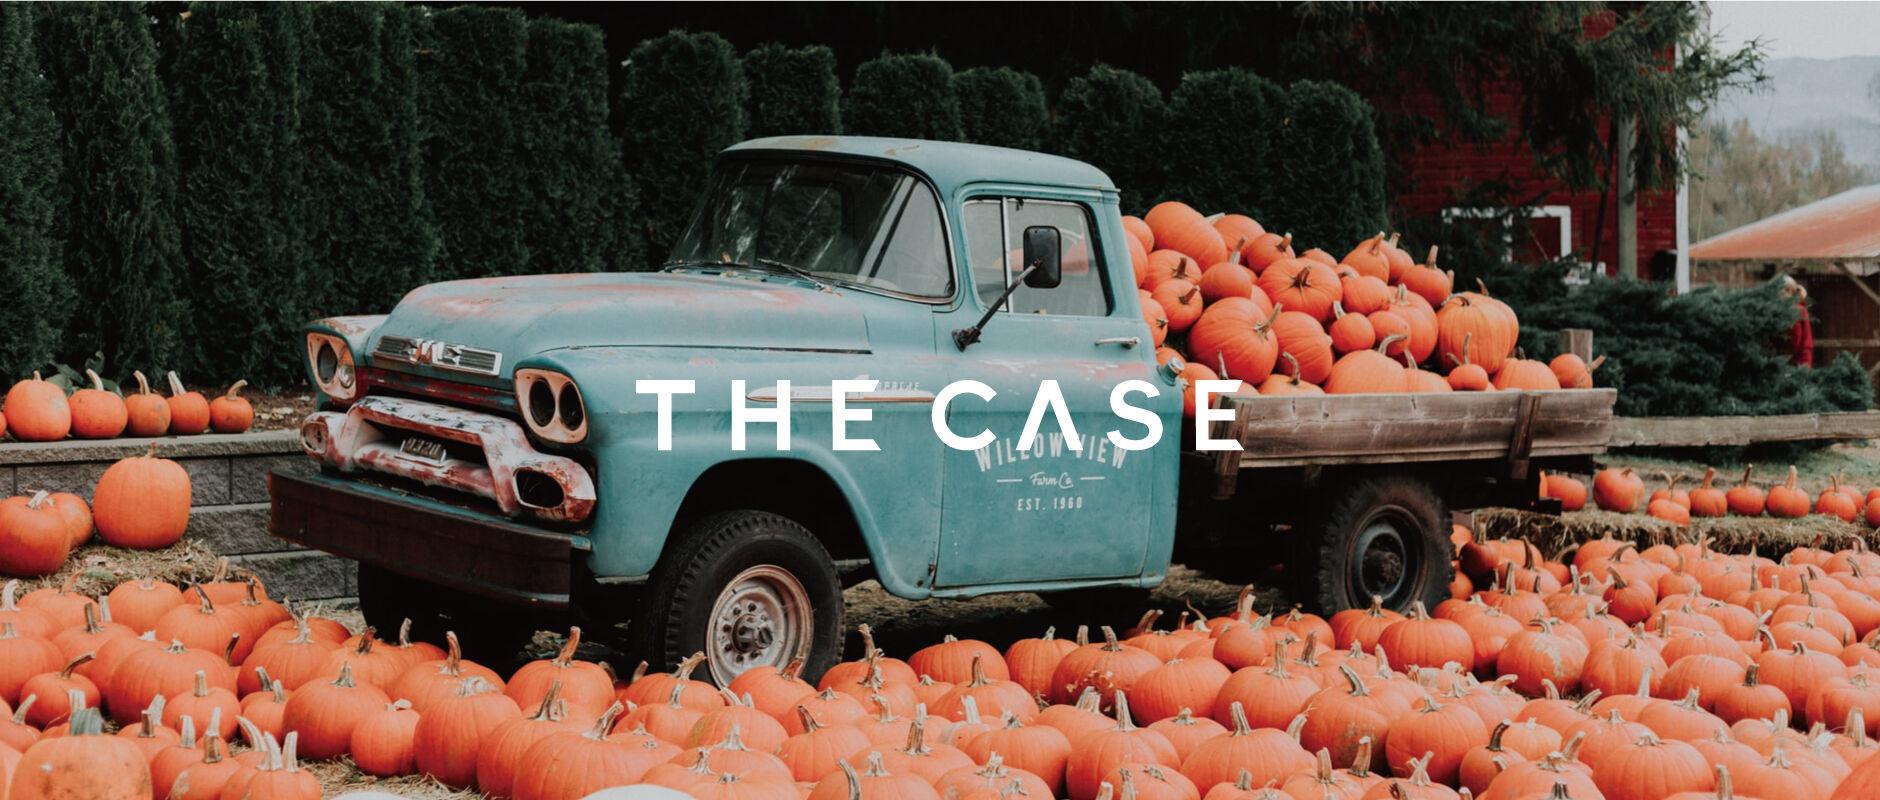 THE CASE(ザケース) 公式 オンラインストア